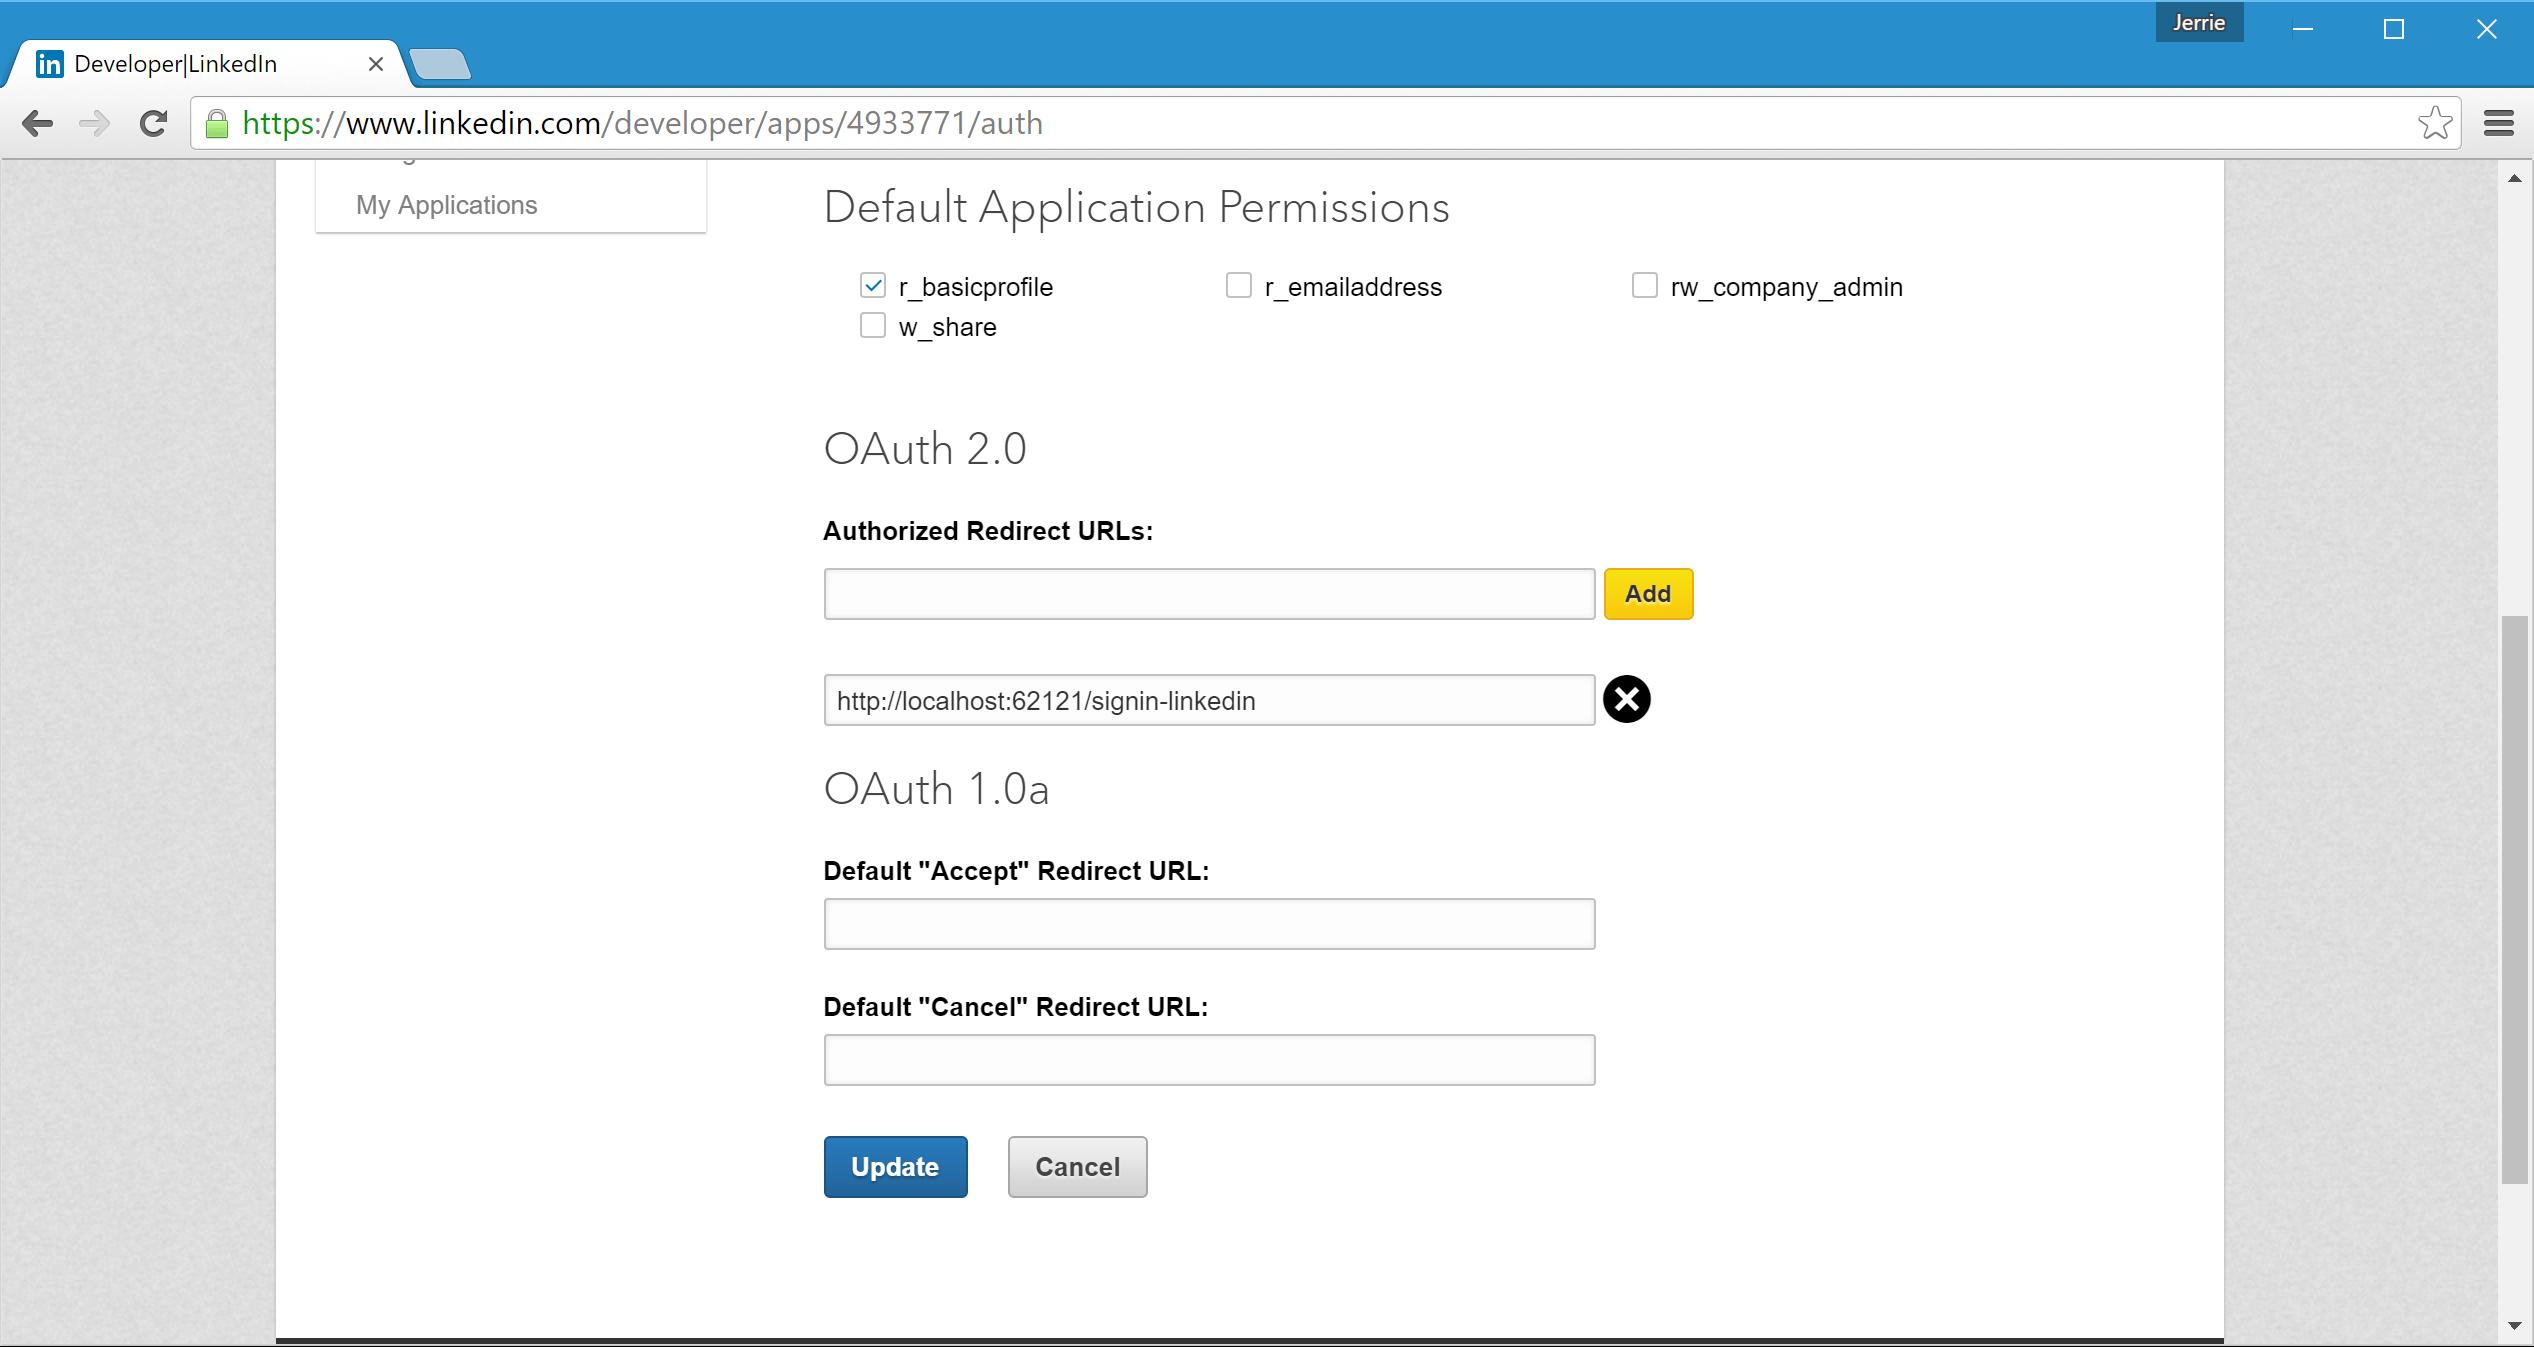 Adding the Authorized Redirect URL